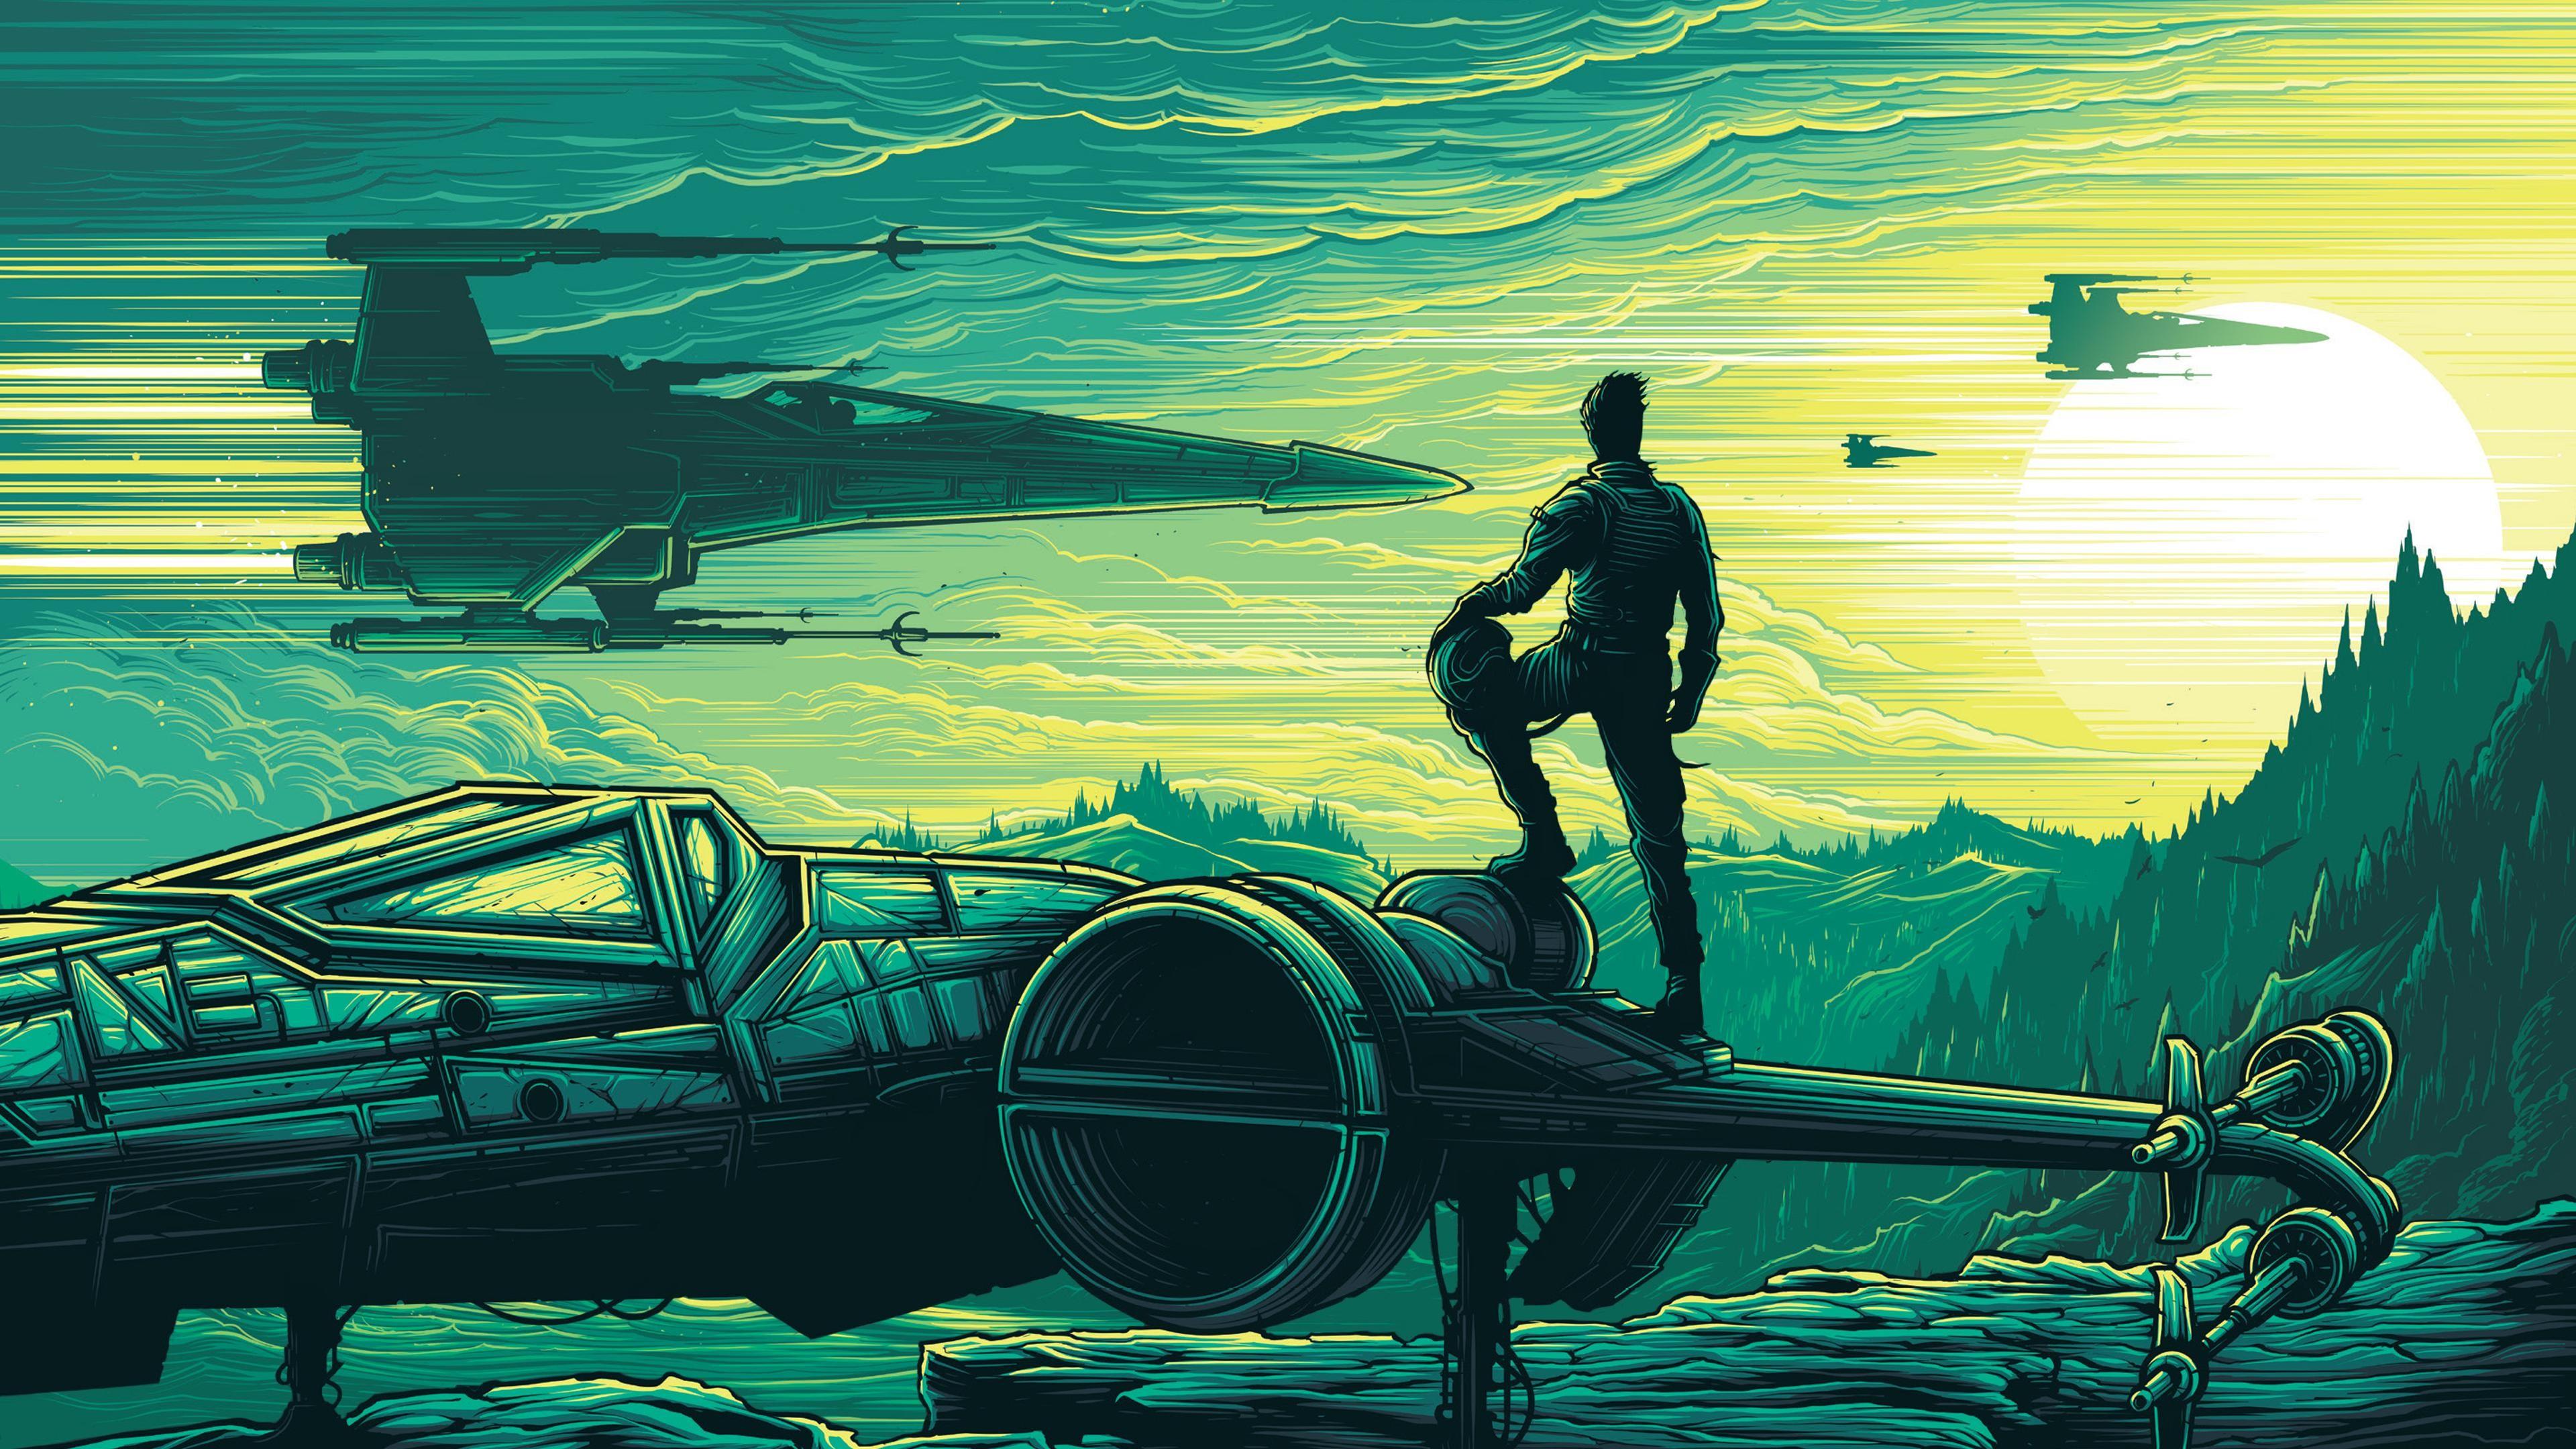 Wallpaper illustration star wars vehicle star wars - Star wars the force awakens desktop wallpaper ...